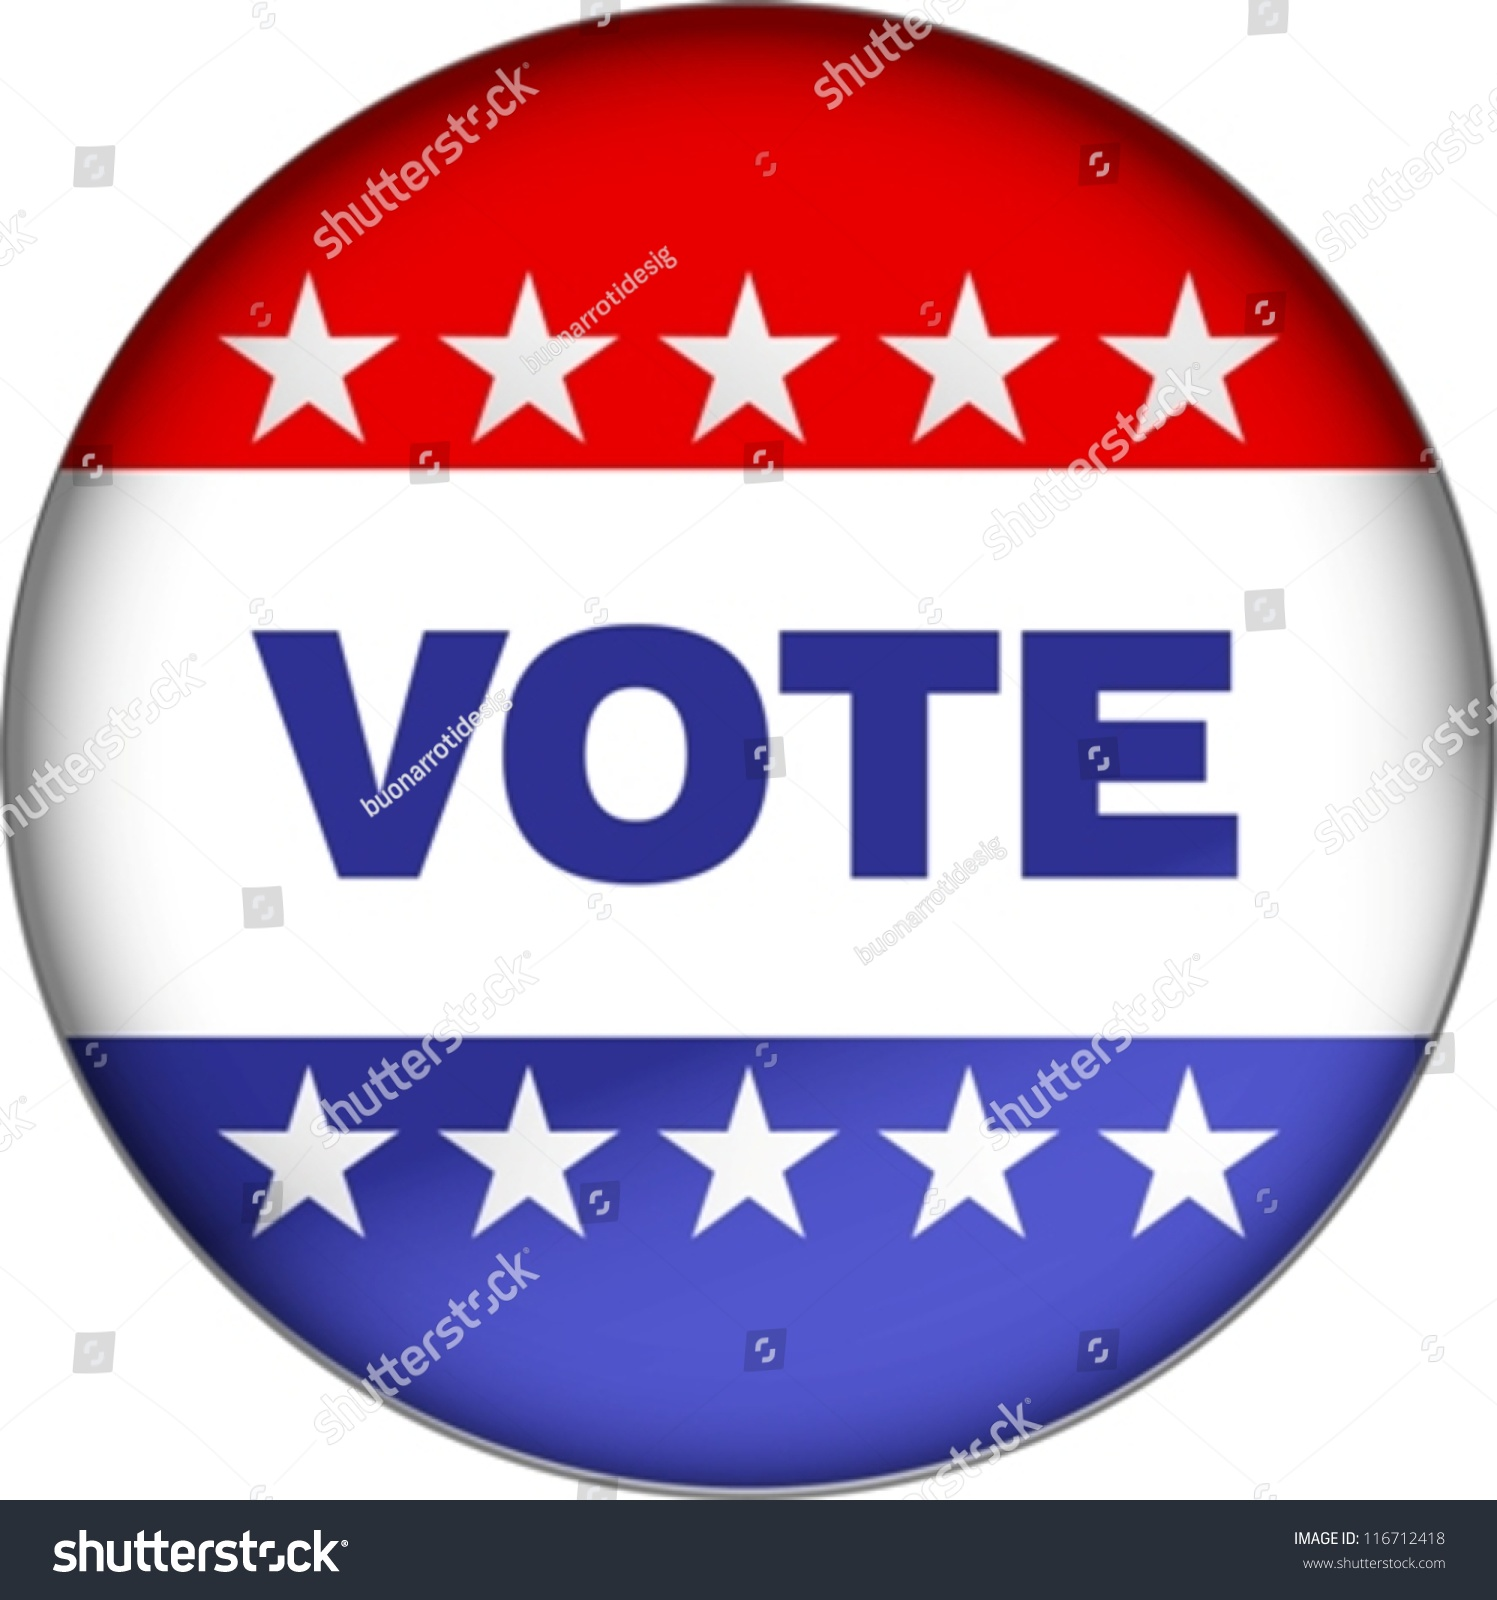 where can i vote - photo #21